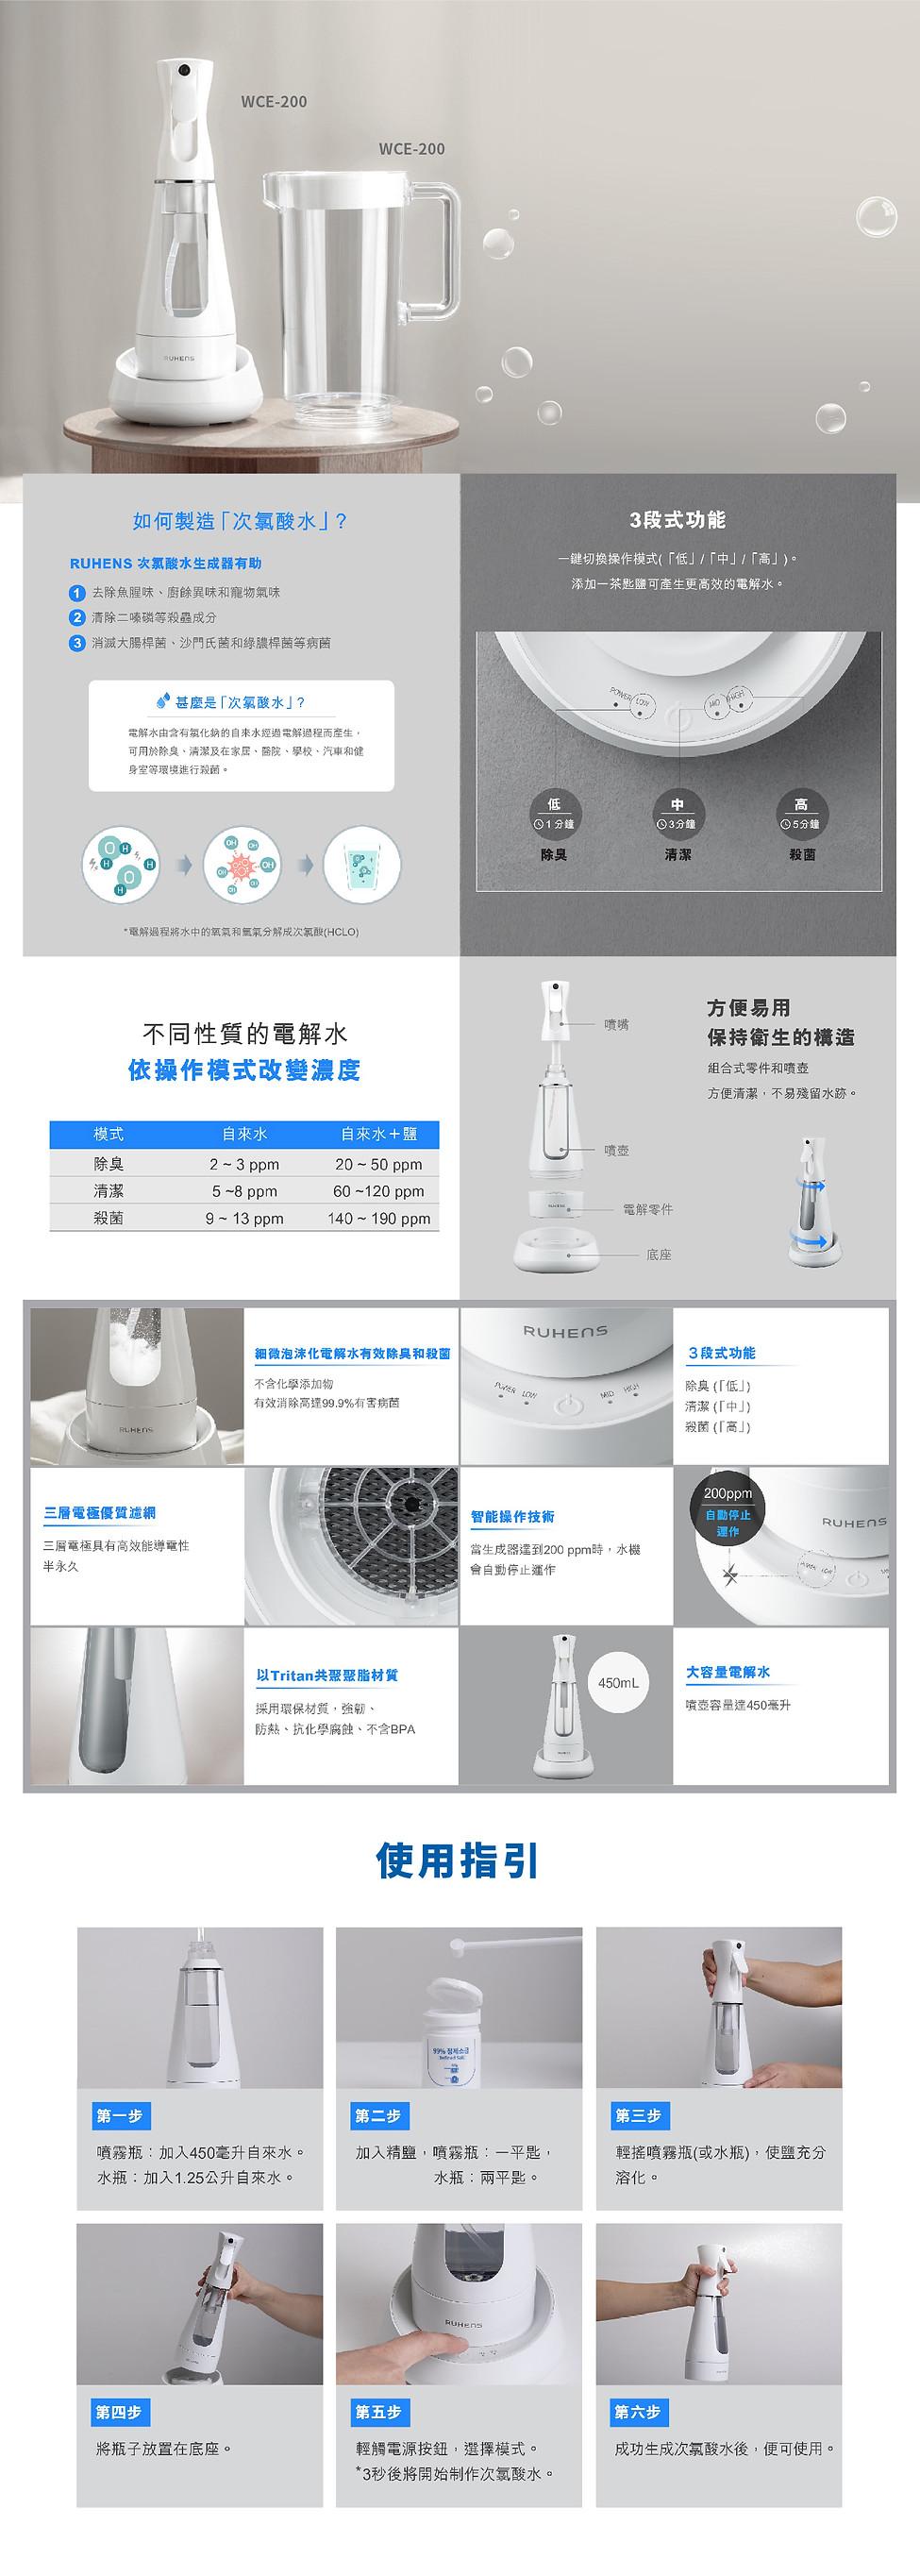 T4H_Web Banner_water filter_11.jpg